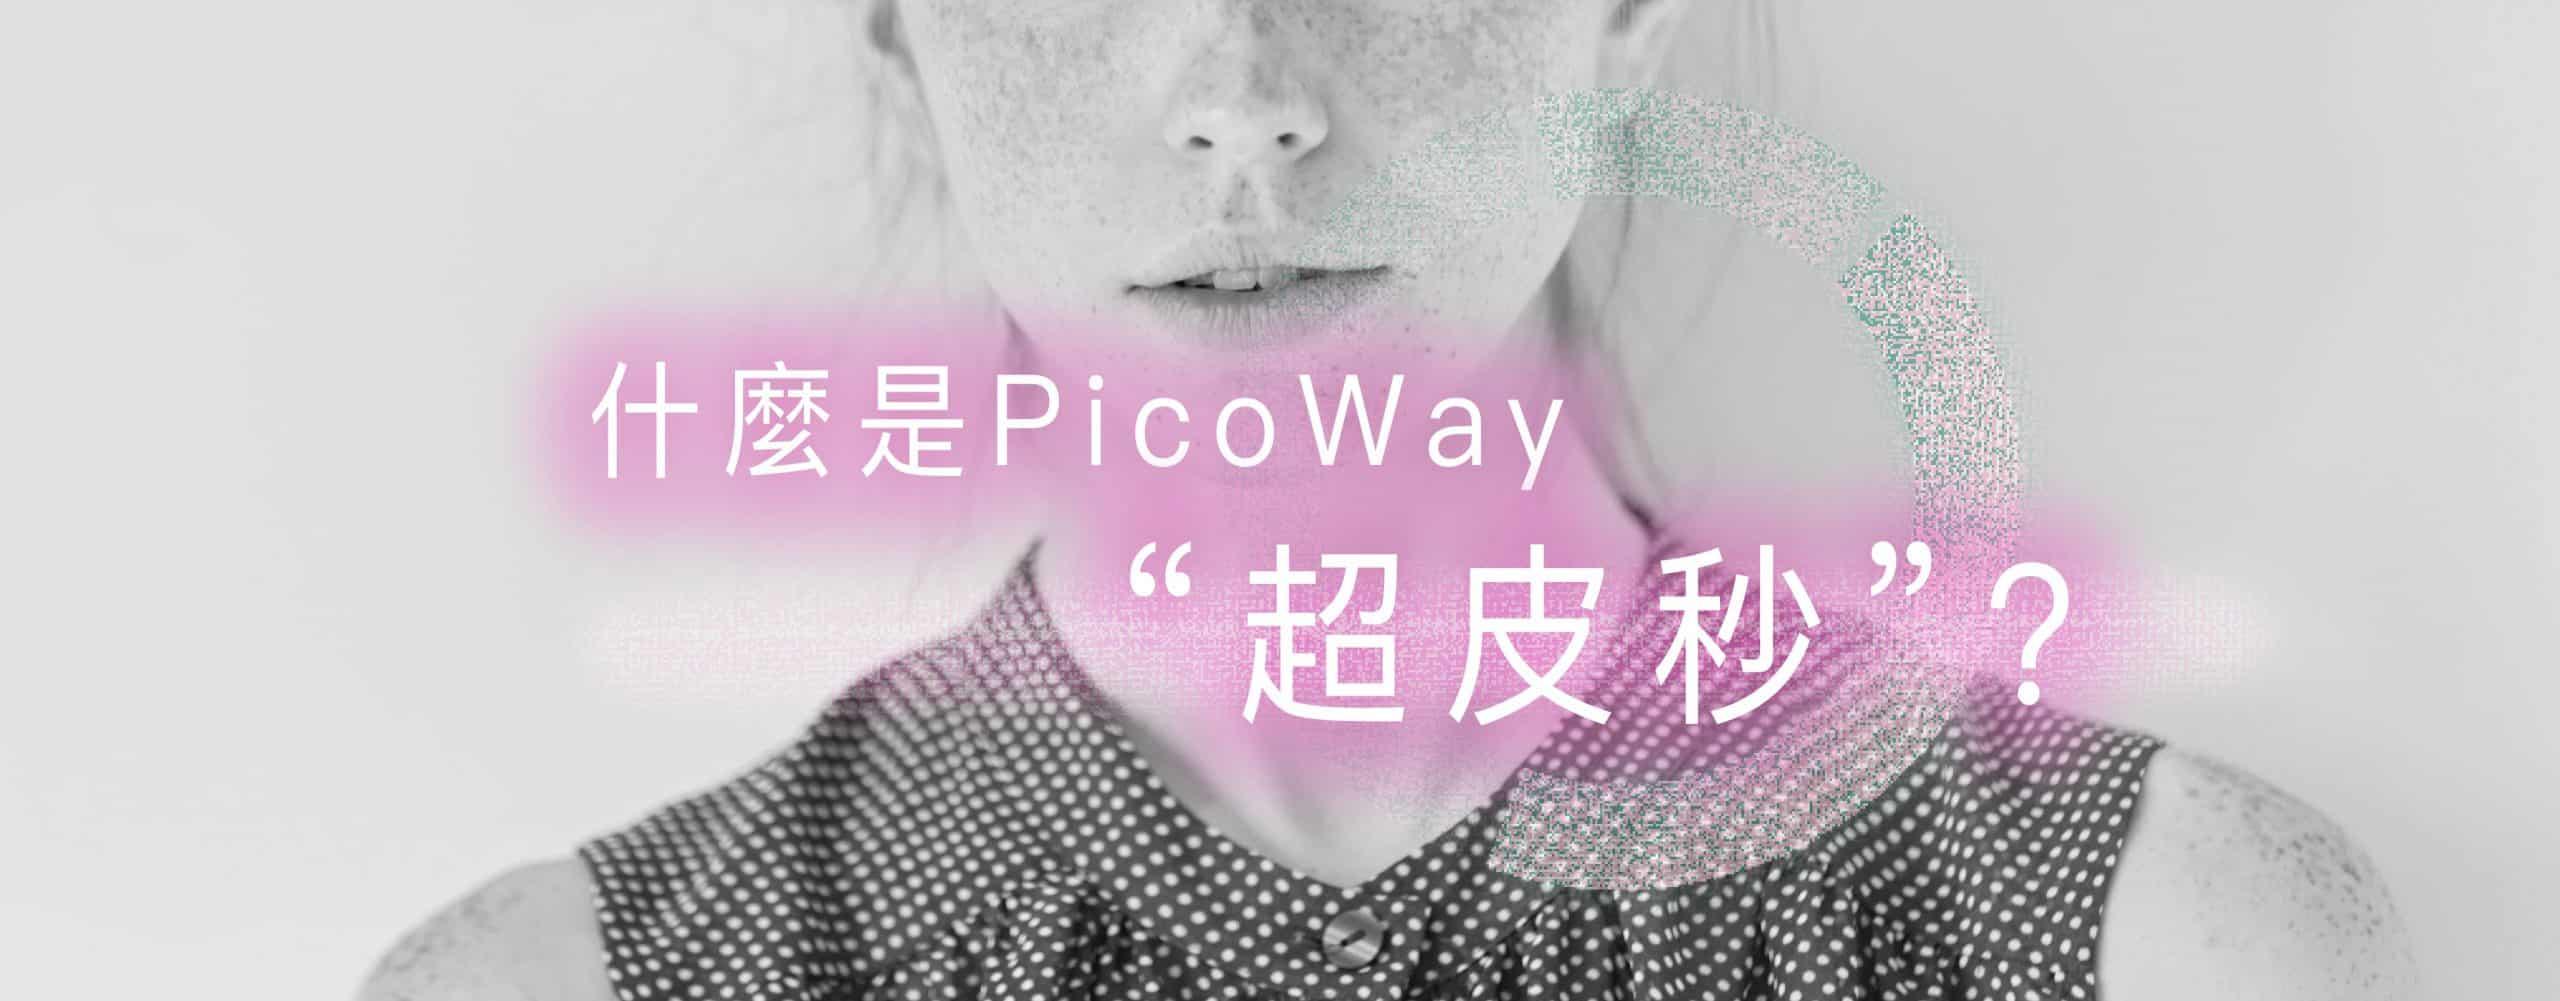 Picoway Picoway ptop3 46 scaled